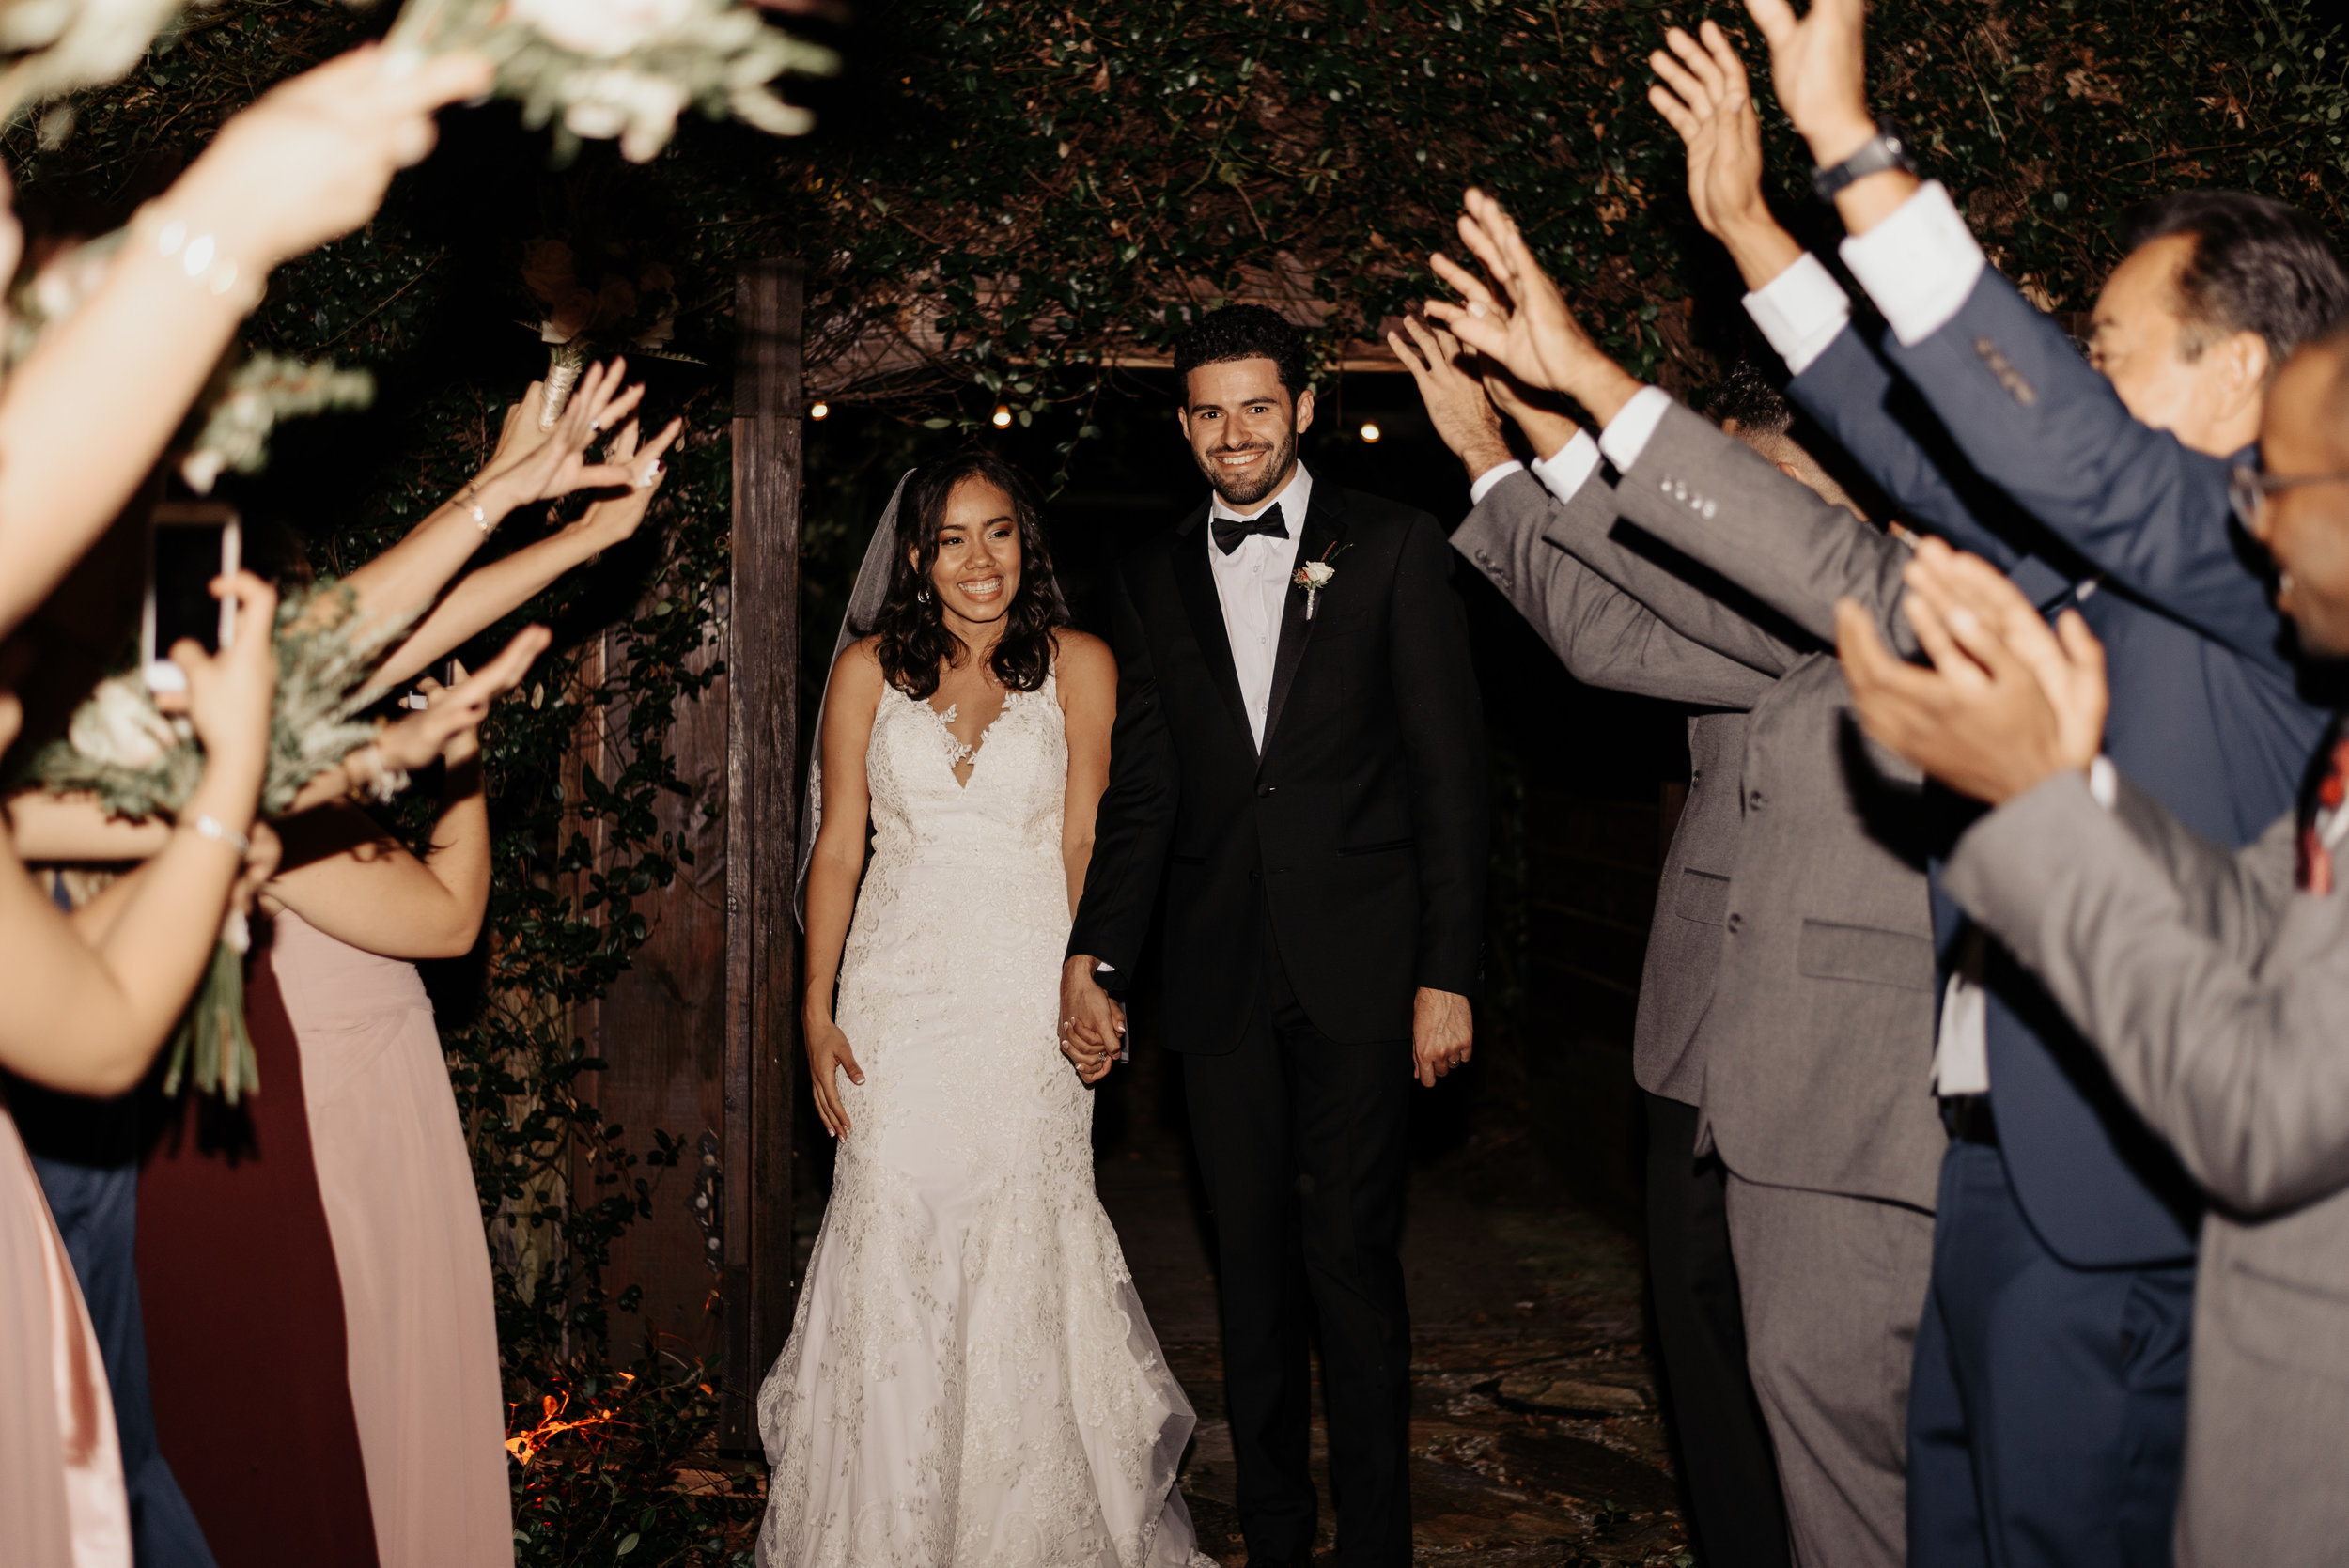 Kirstie-AJ-Wedding-9158.jpg